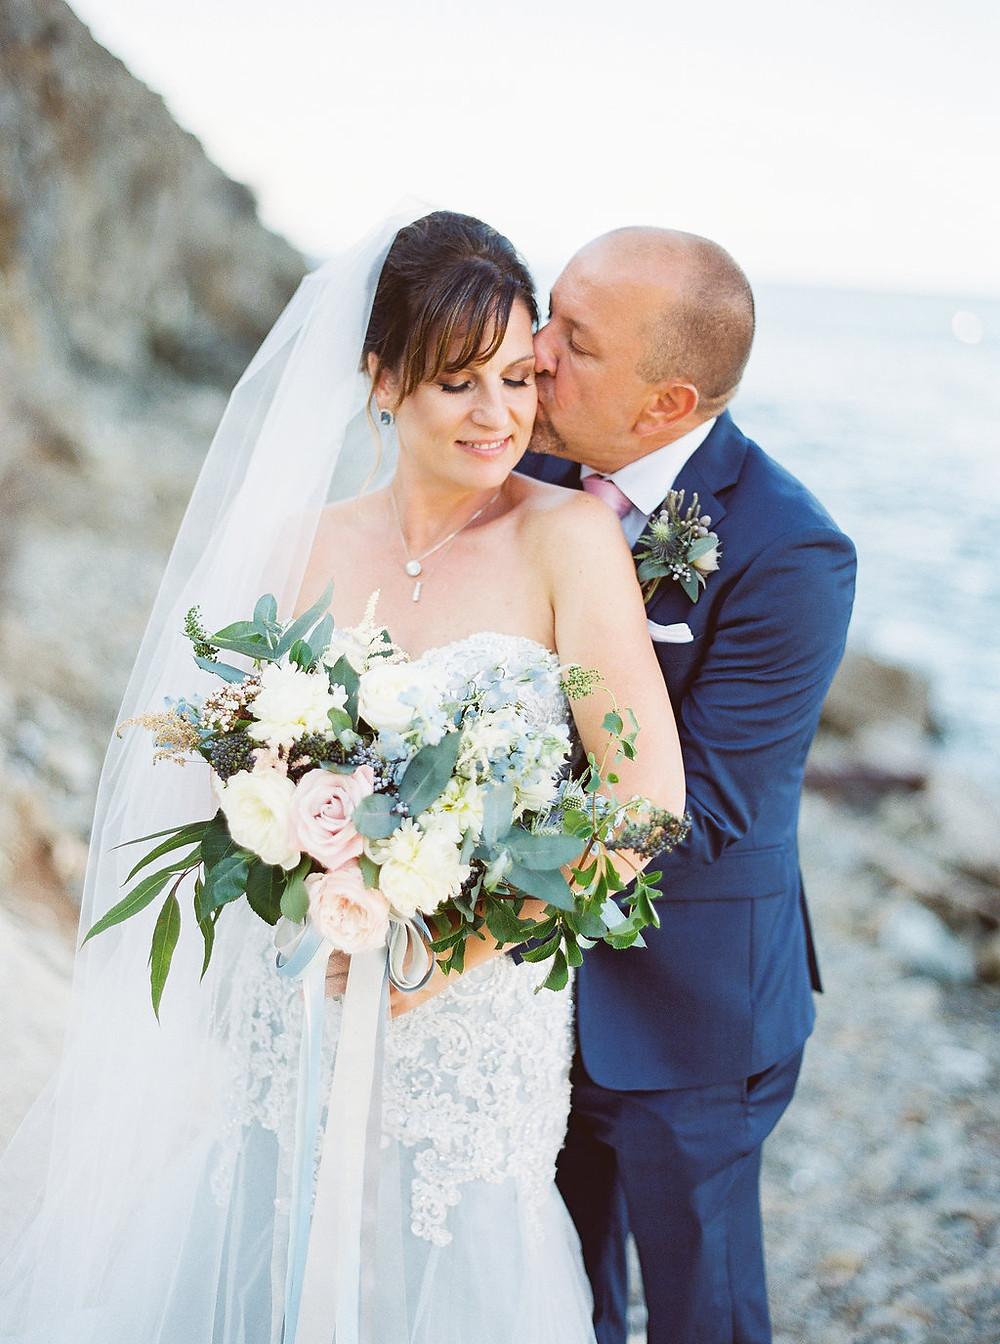 Destination Wedding Photographer | Elyse Hall